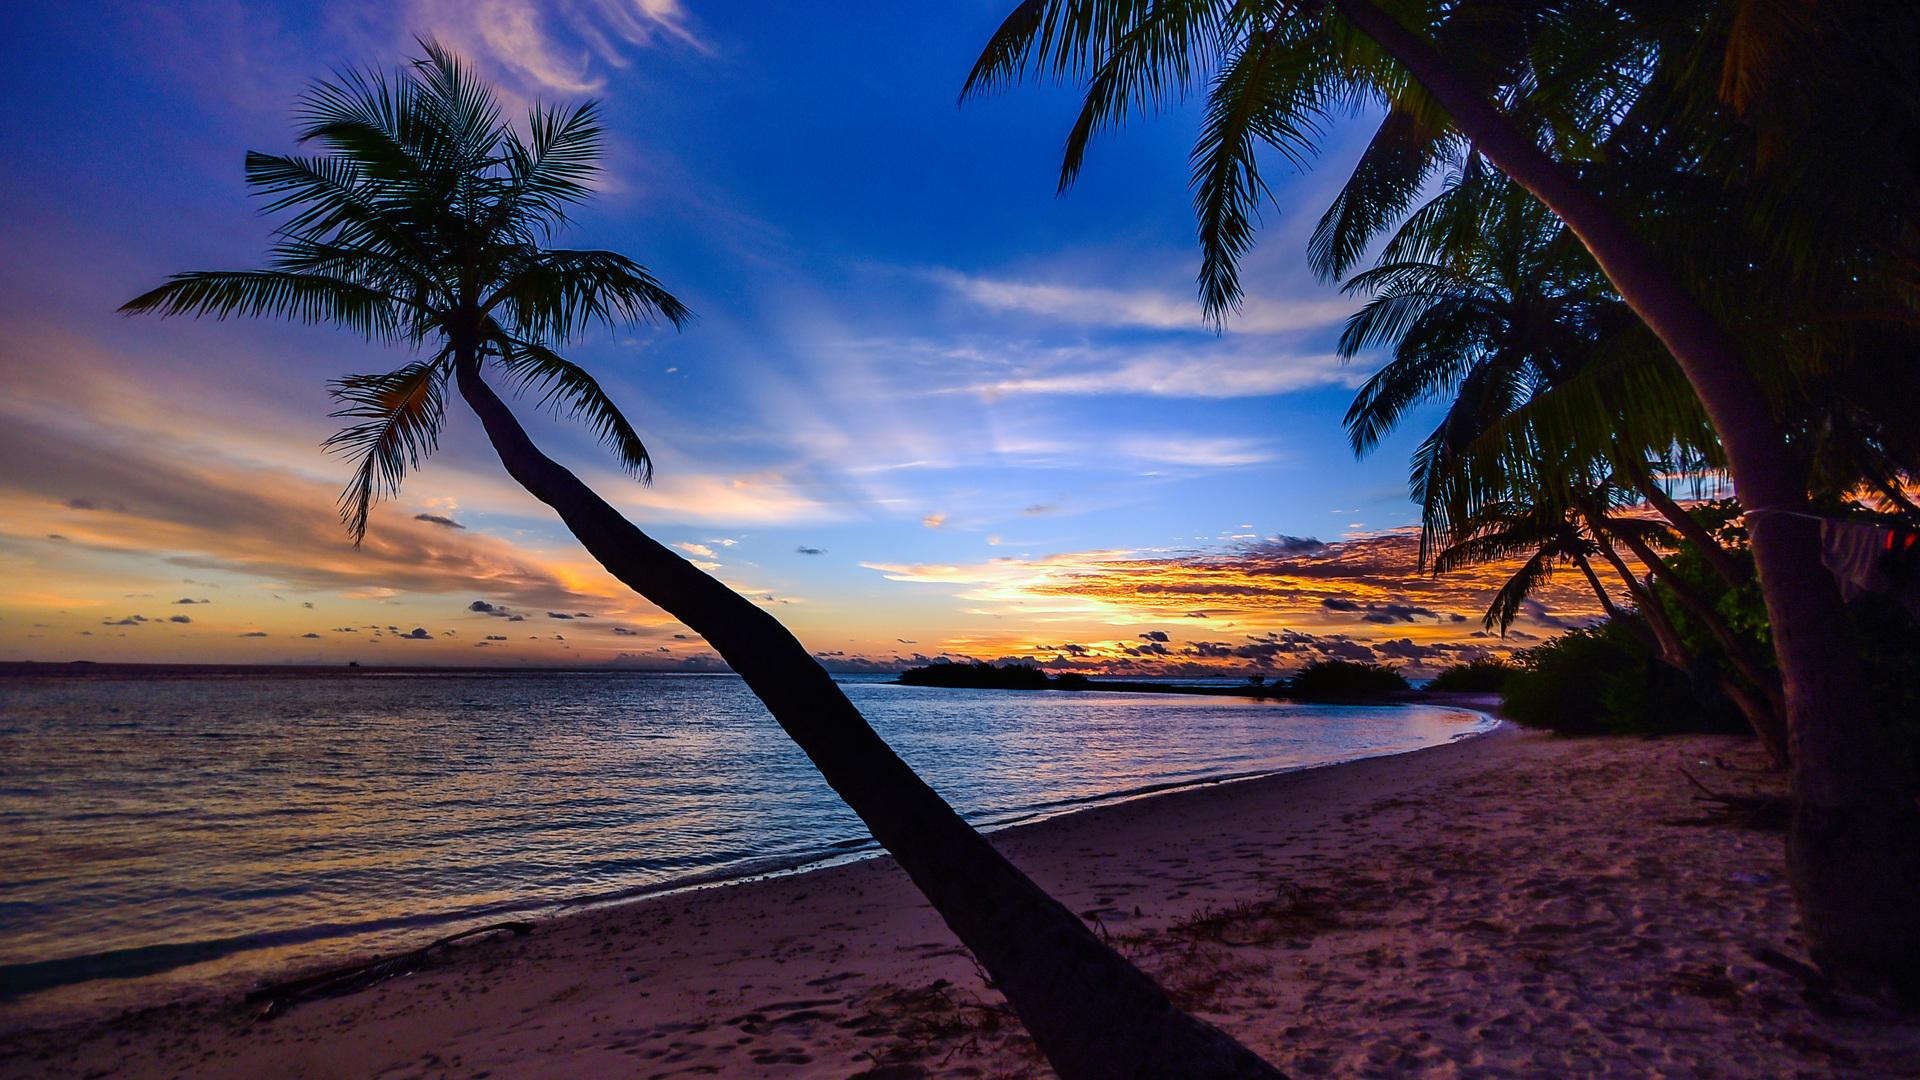 Coconut Trees Beach Clouds W7